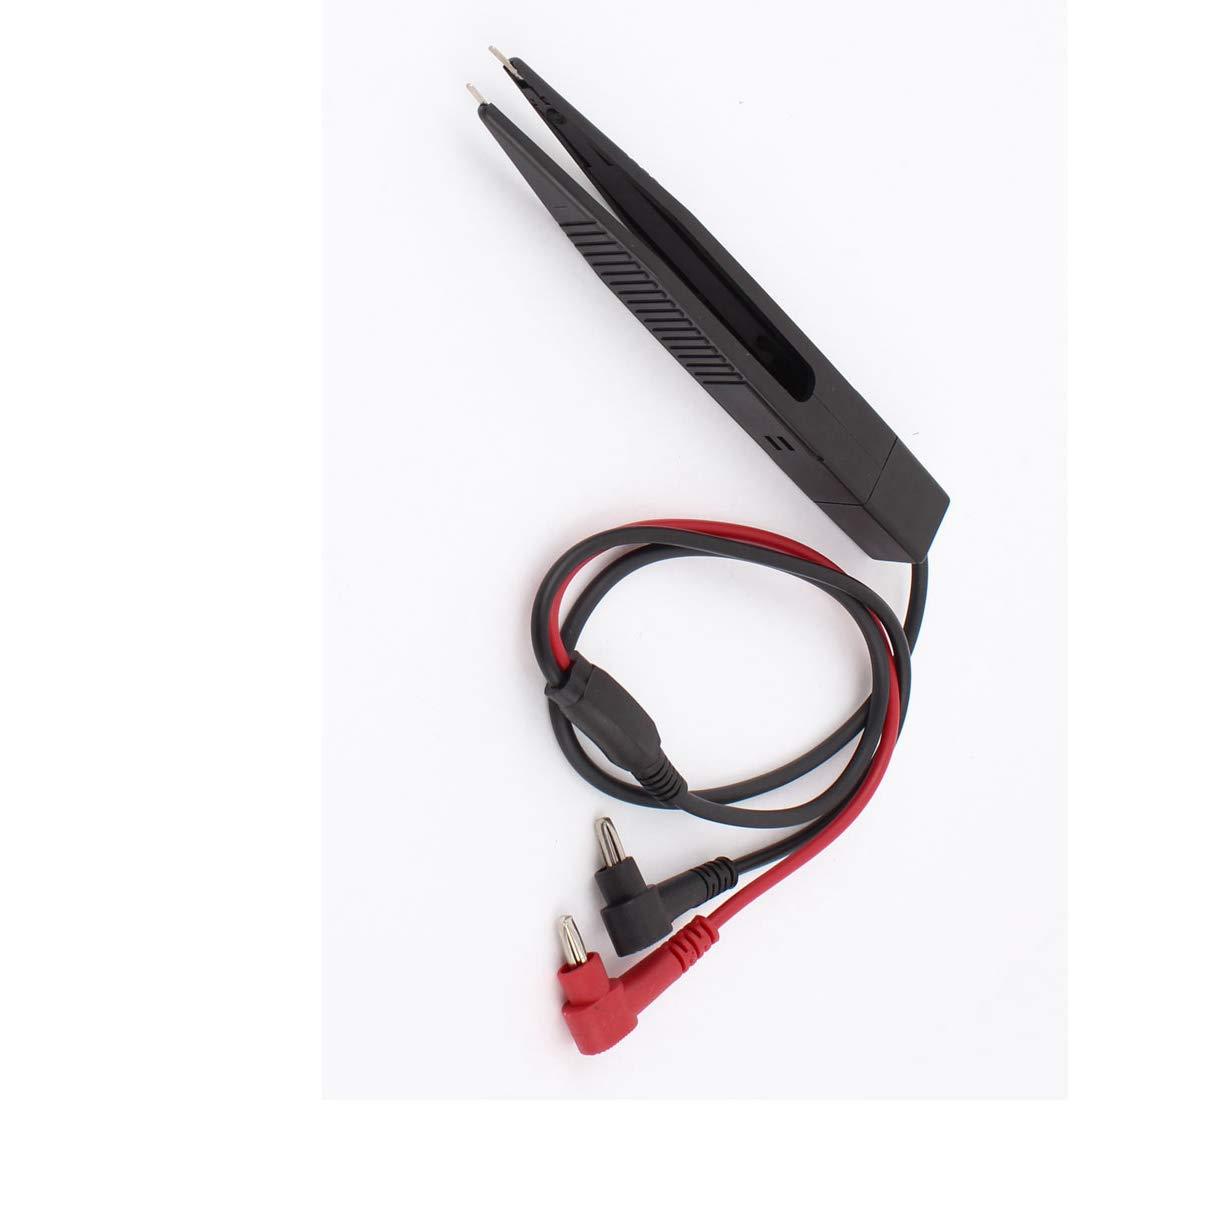 SMD Resistor Multimeter Capacitor Test Clip Inductor Tester Meter Probe Tweezer